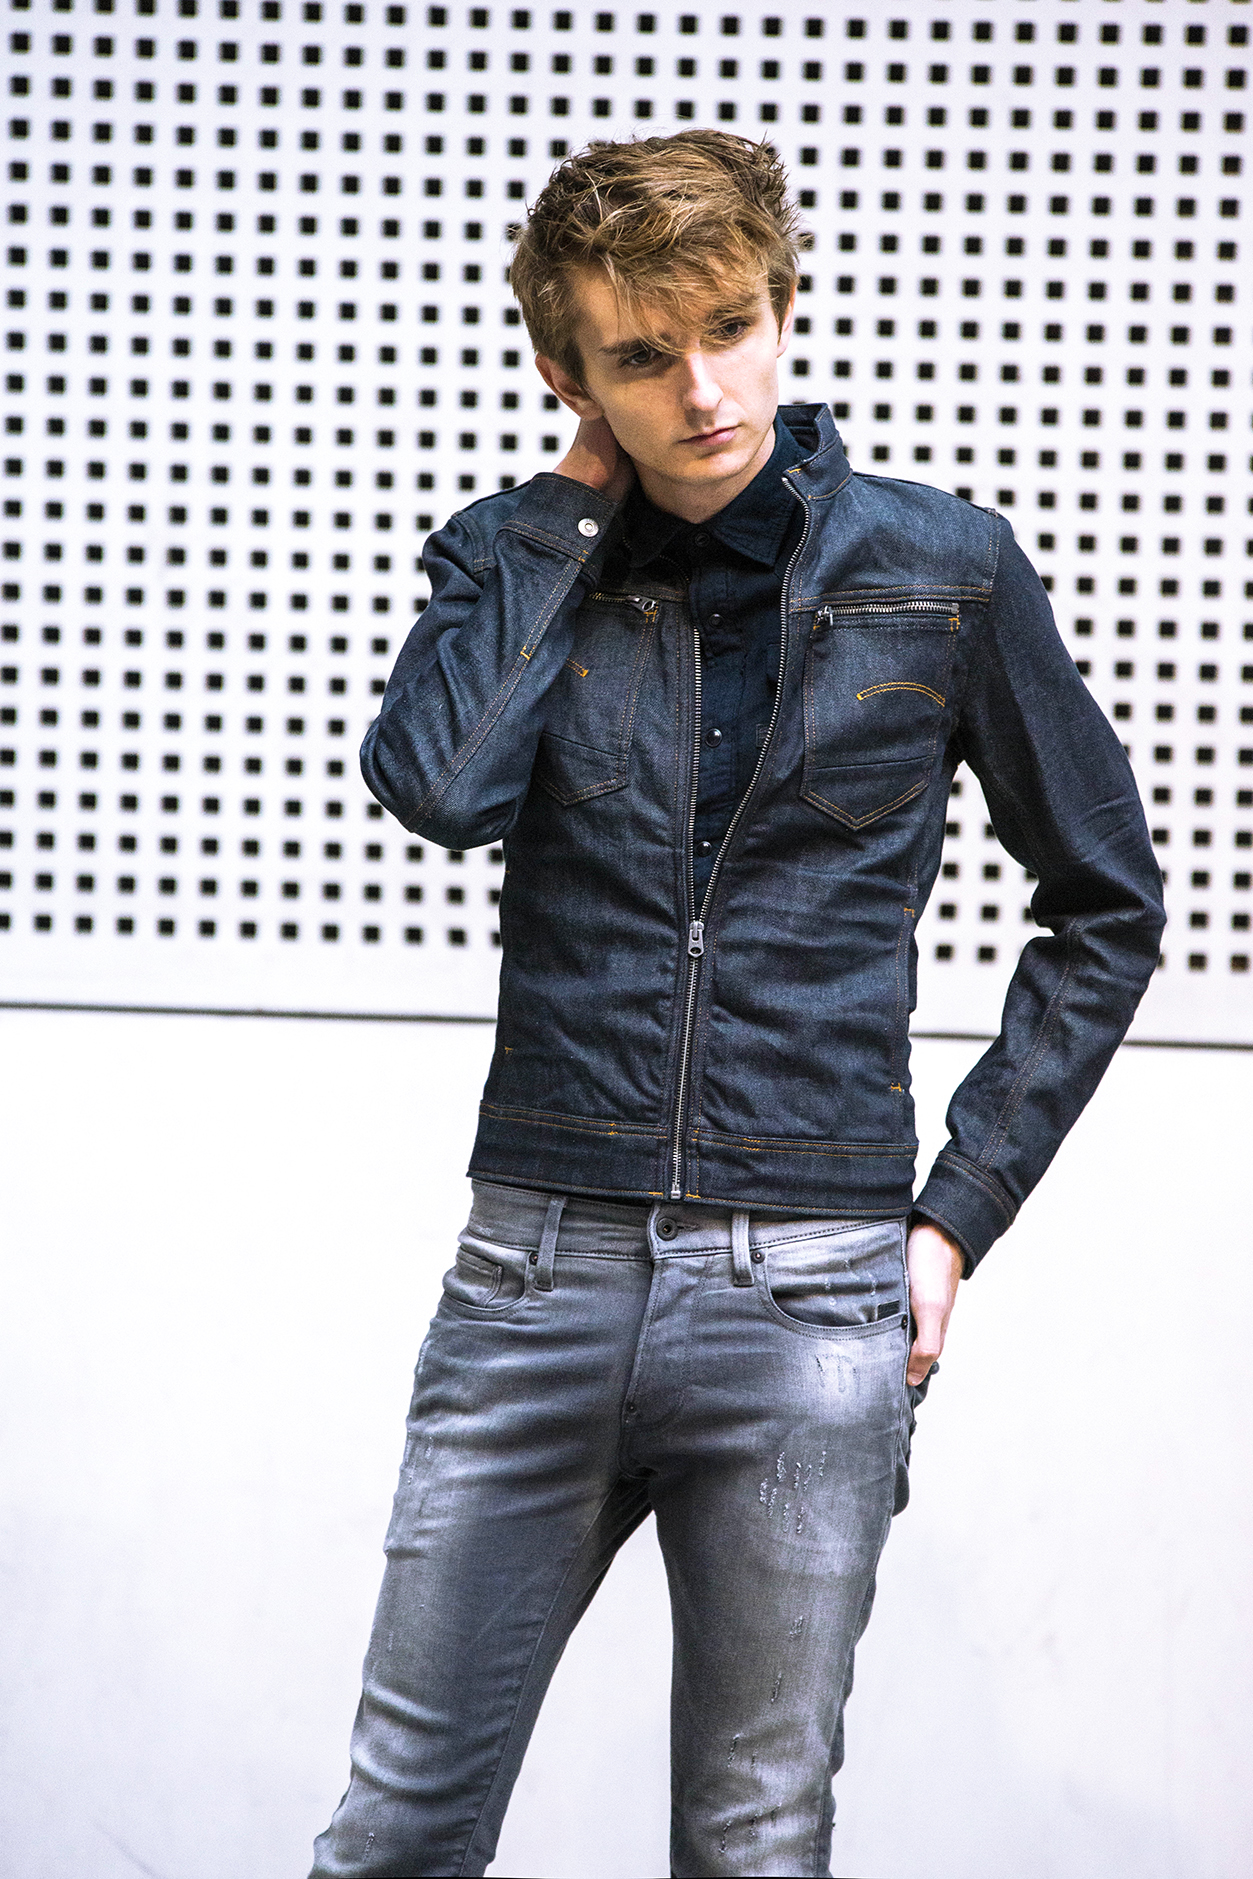 blog-mode-homme-strasbourg-masuculin-paris-lifestyle-blogueur-fashion-blogger-french-gstar-raw-pharrell-jean-denim-edito-3